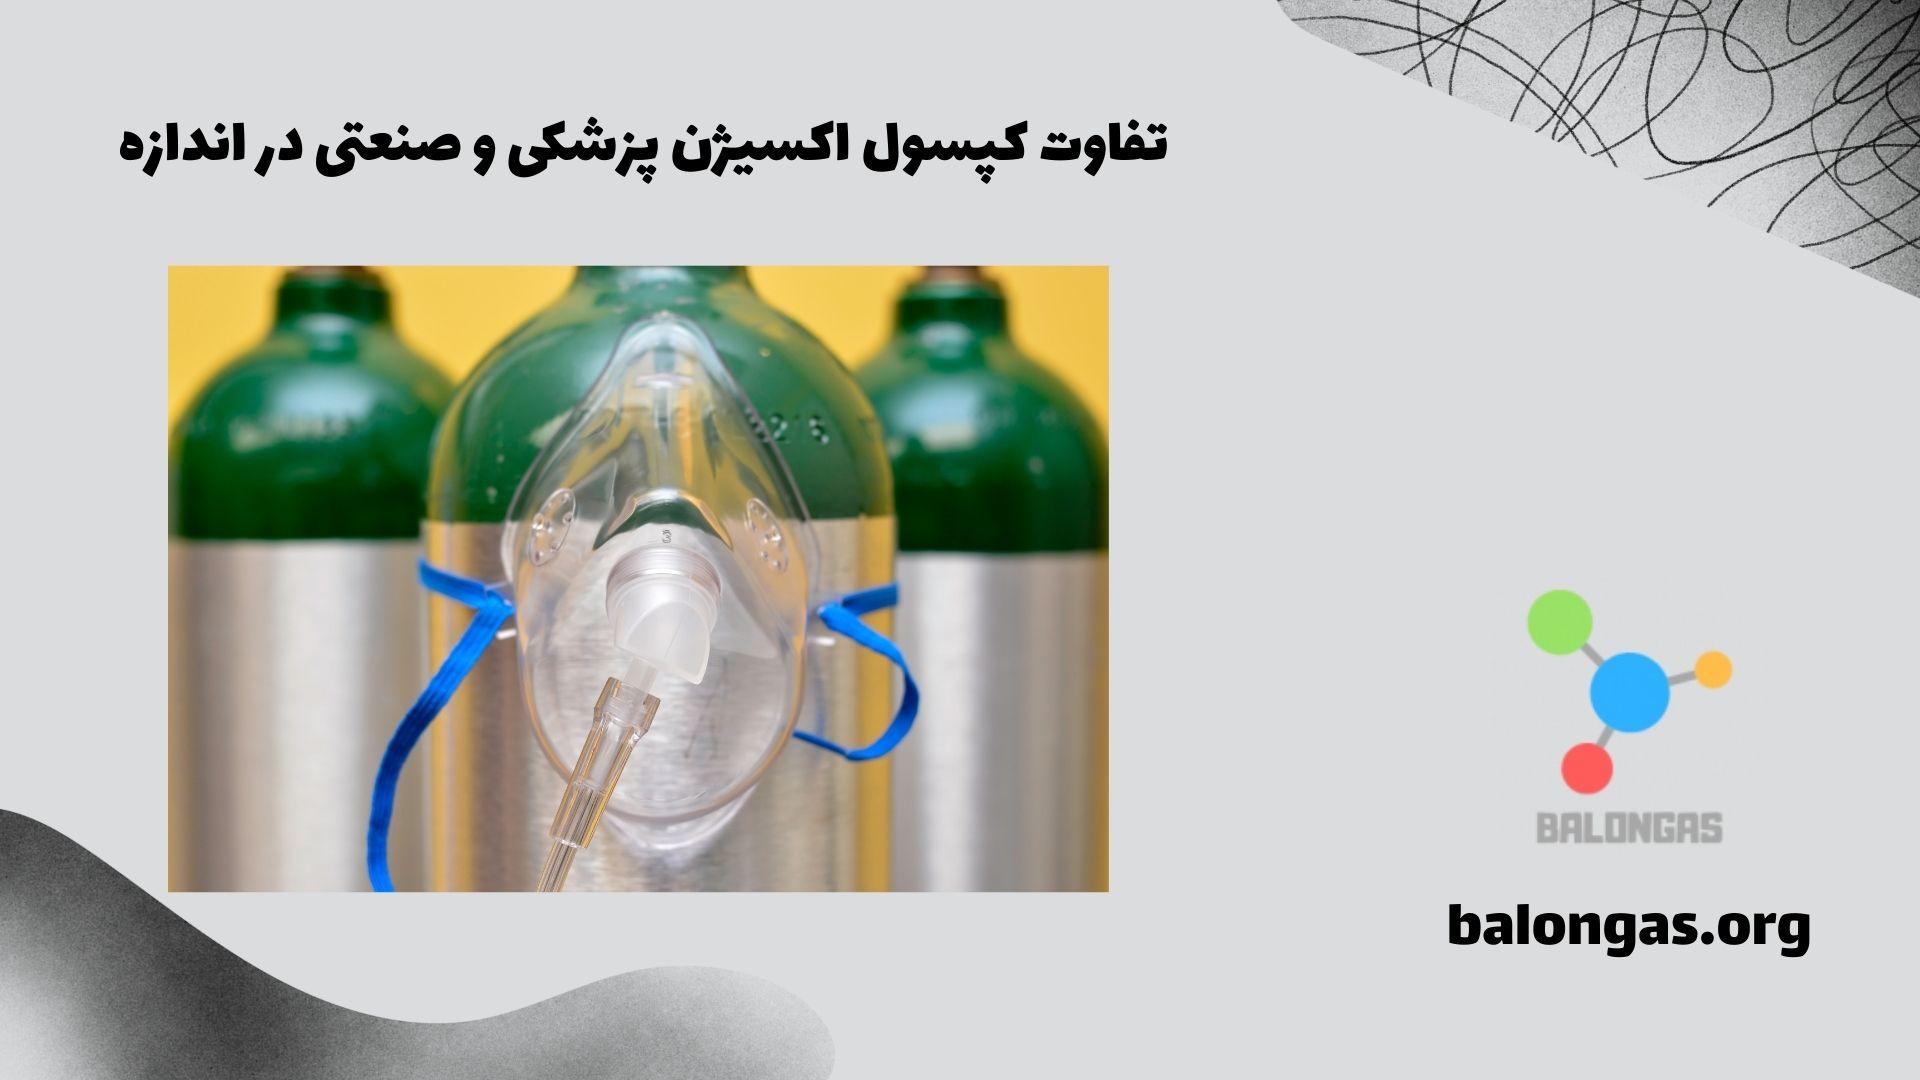 تفاوت کپسول اکسیژن پزشکی و صنعتی در اندازه